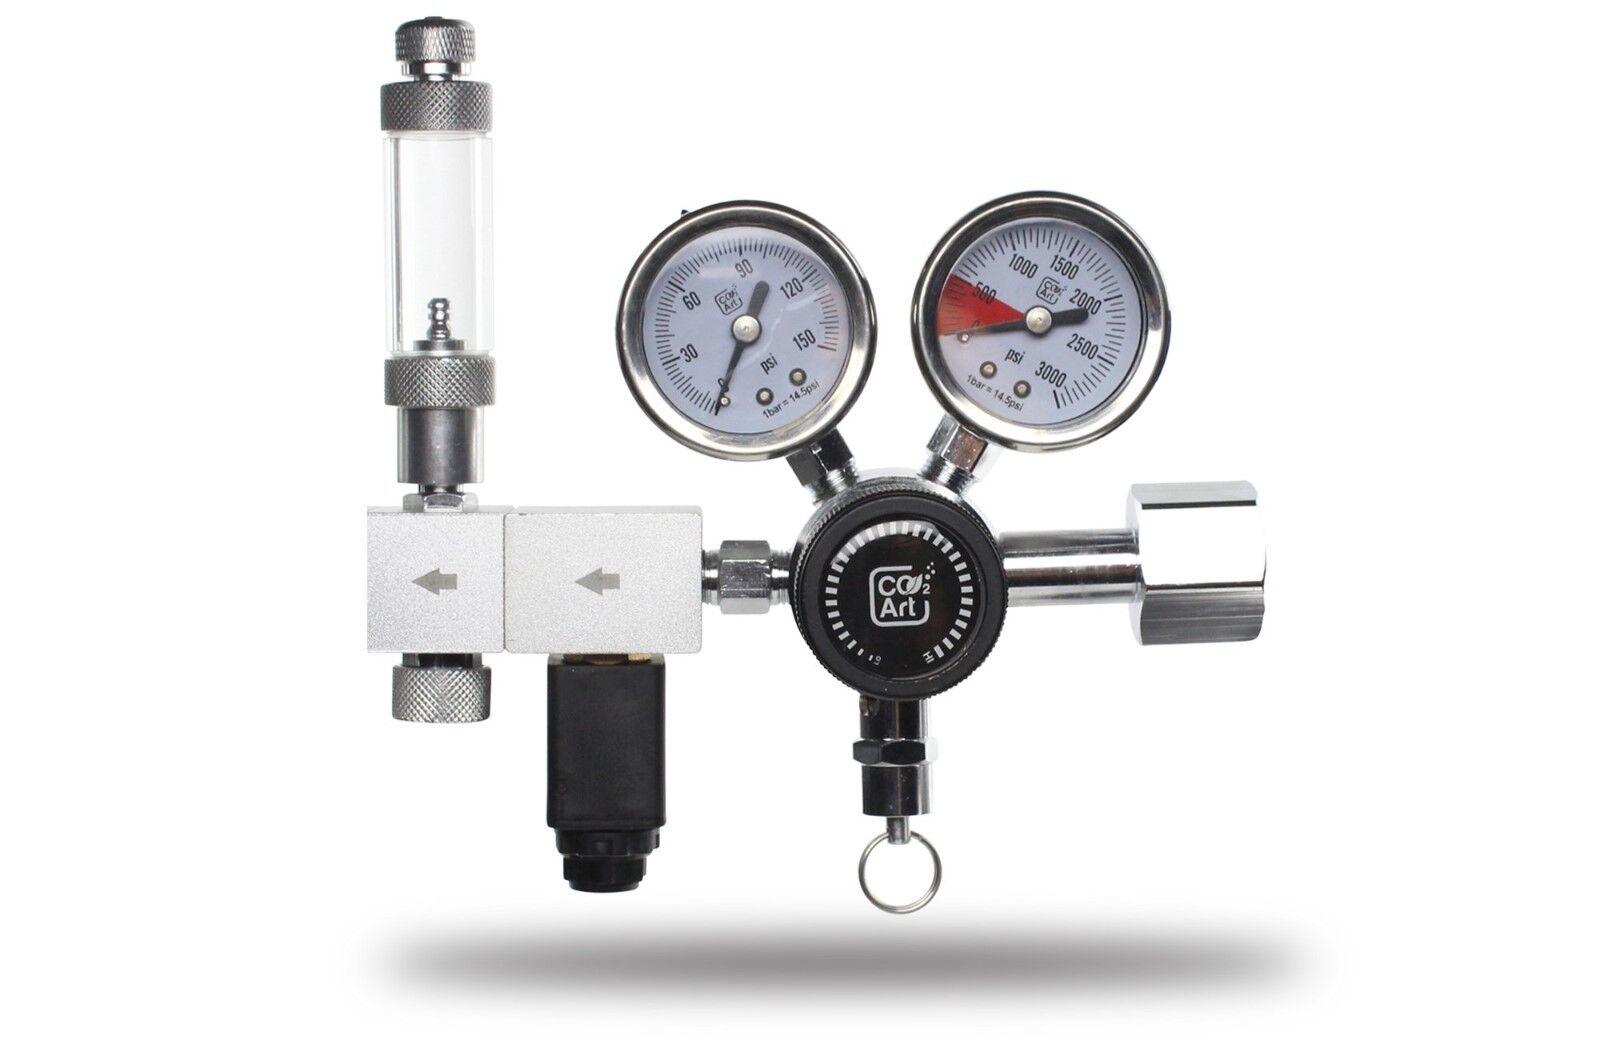 ACQUARIO CO2 regolatori, DUEL e singolo stadio con solenoide, Sodastream Adattatore